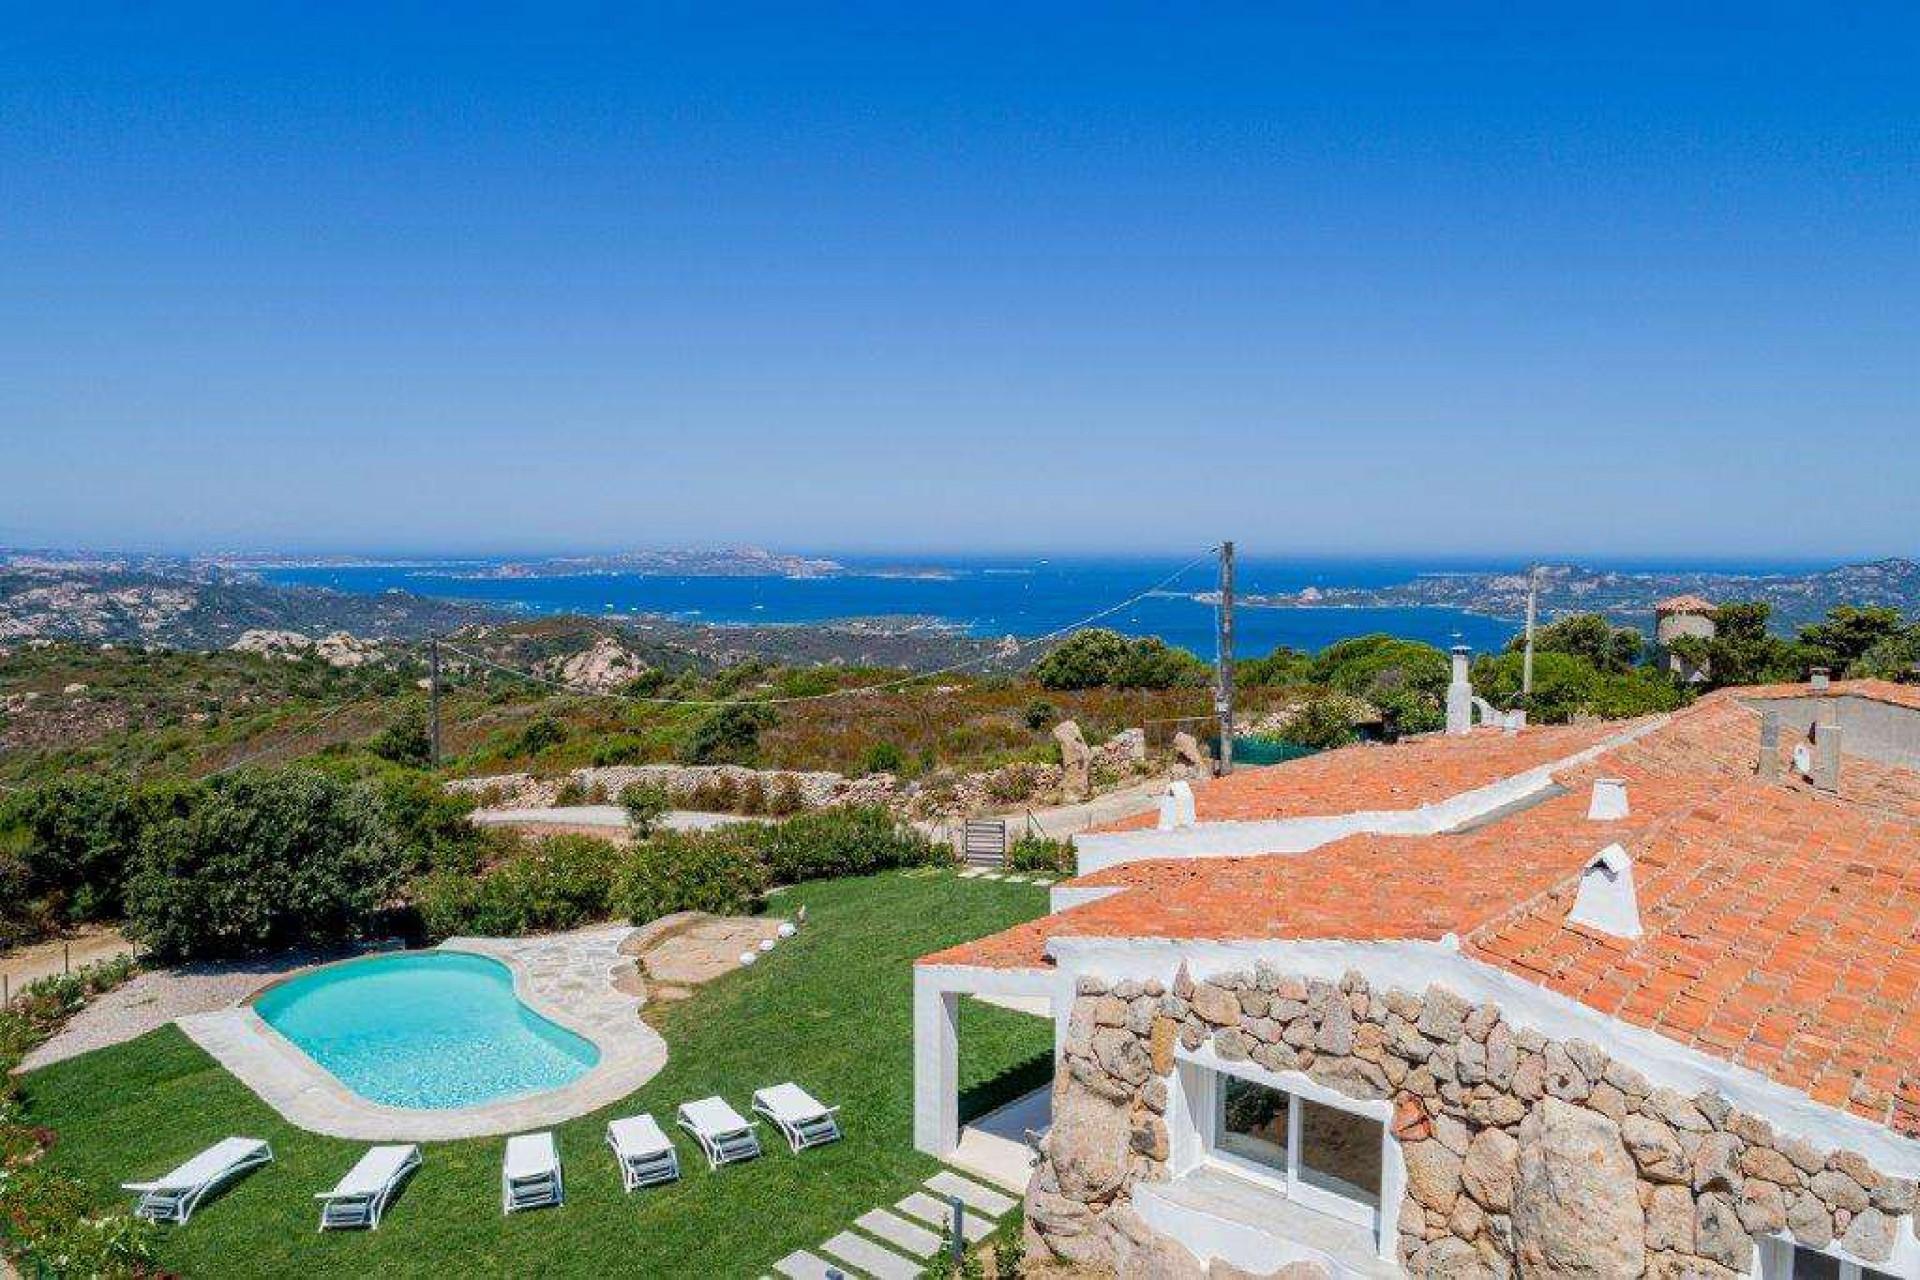 Villa with sea view. For sale